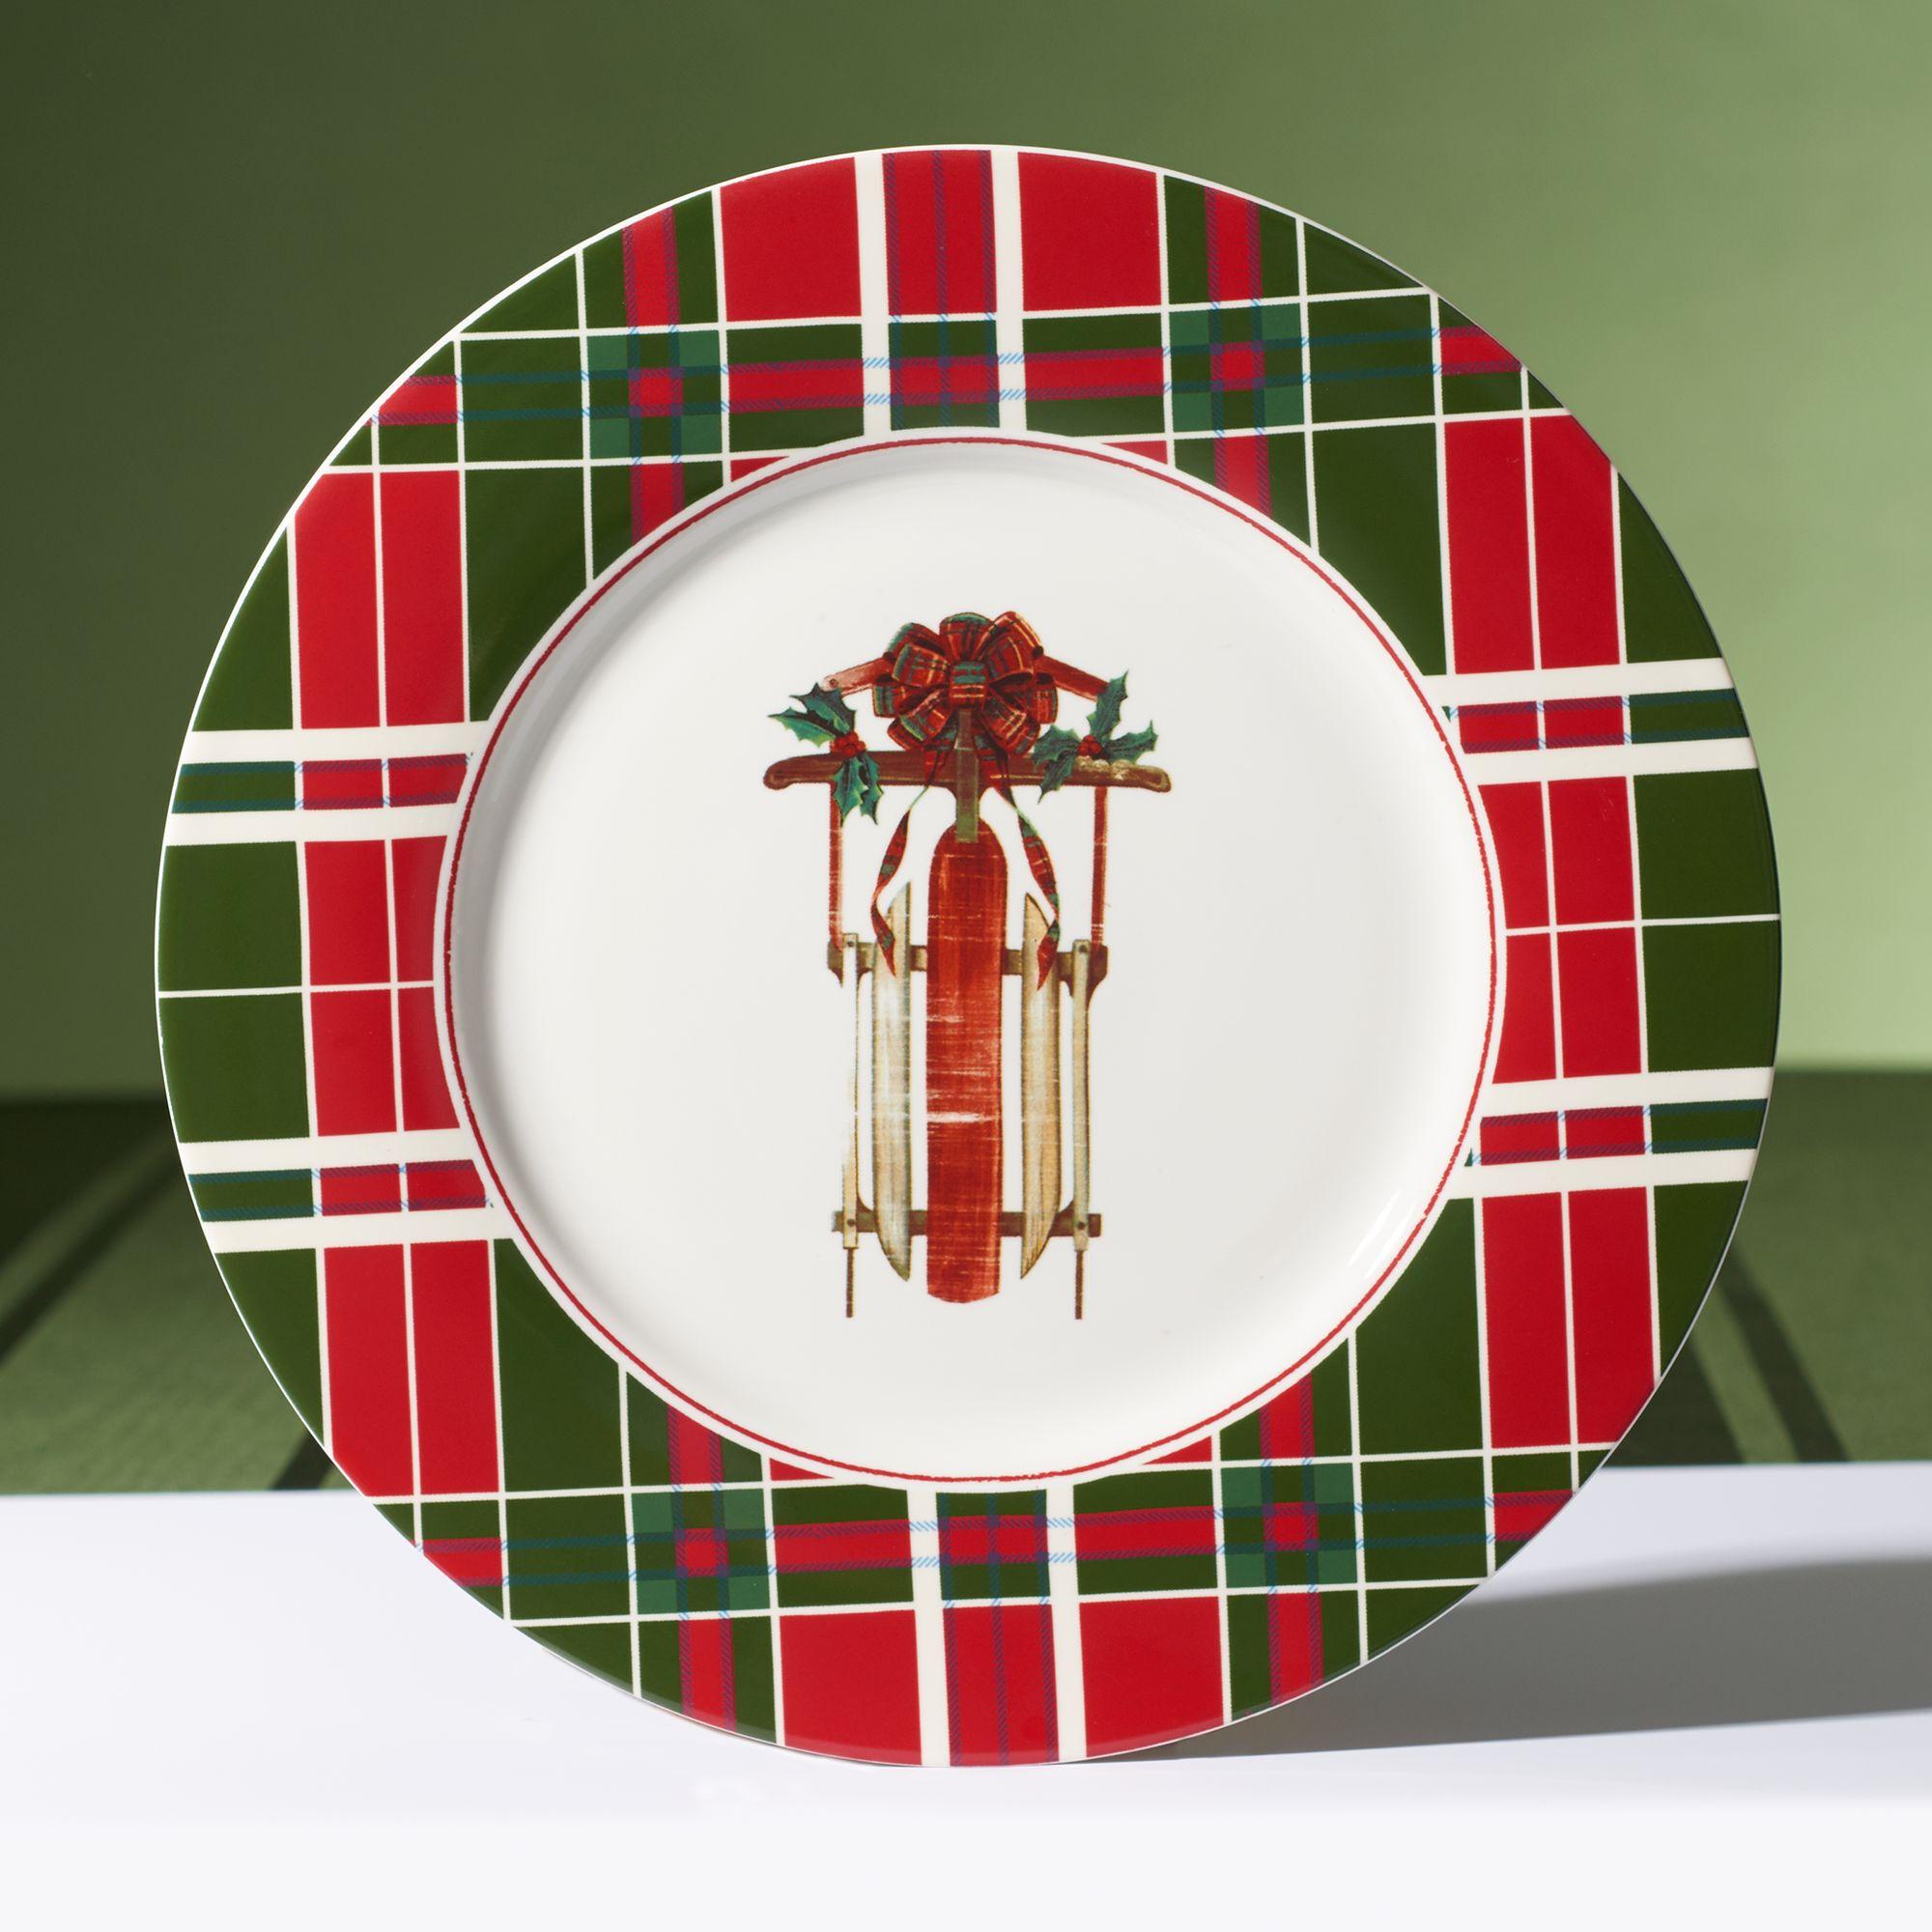 Lenox u0026quot;Vintage Plaidu0026quot; Porcelain Dinnerware With Bonus u0026quot;Holiday Jewelsu0026quot; Serveware & Lenox